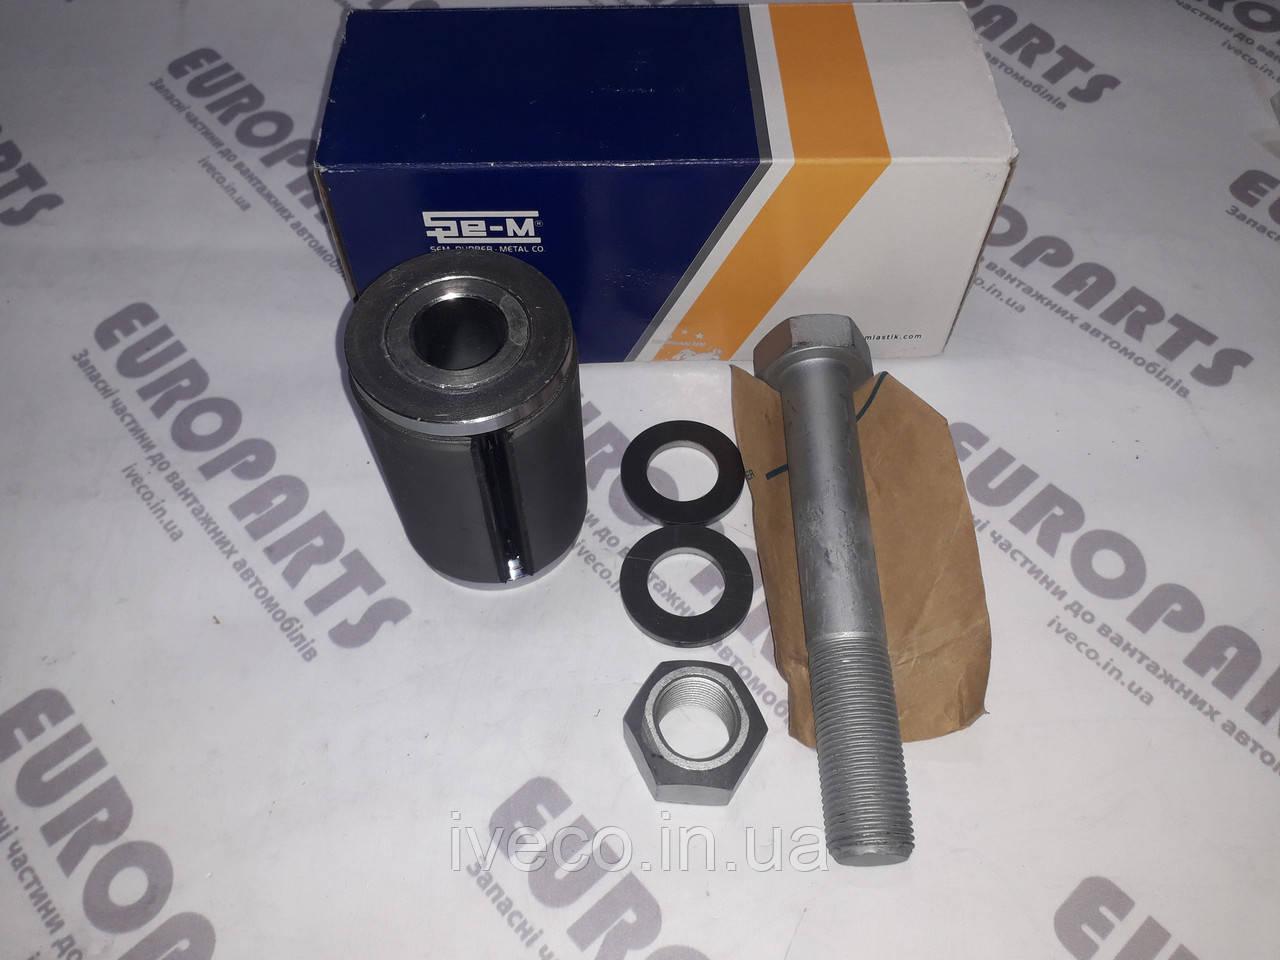 Комплект ремонтний ресори RVI KERAX MAGNUM PREMIUM VOLVO FE 20592656 20929989 7420929989 7420929989S